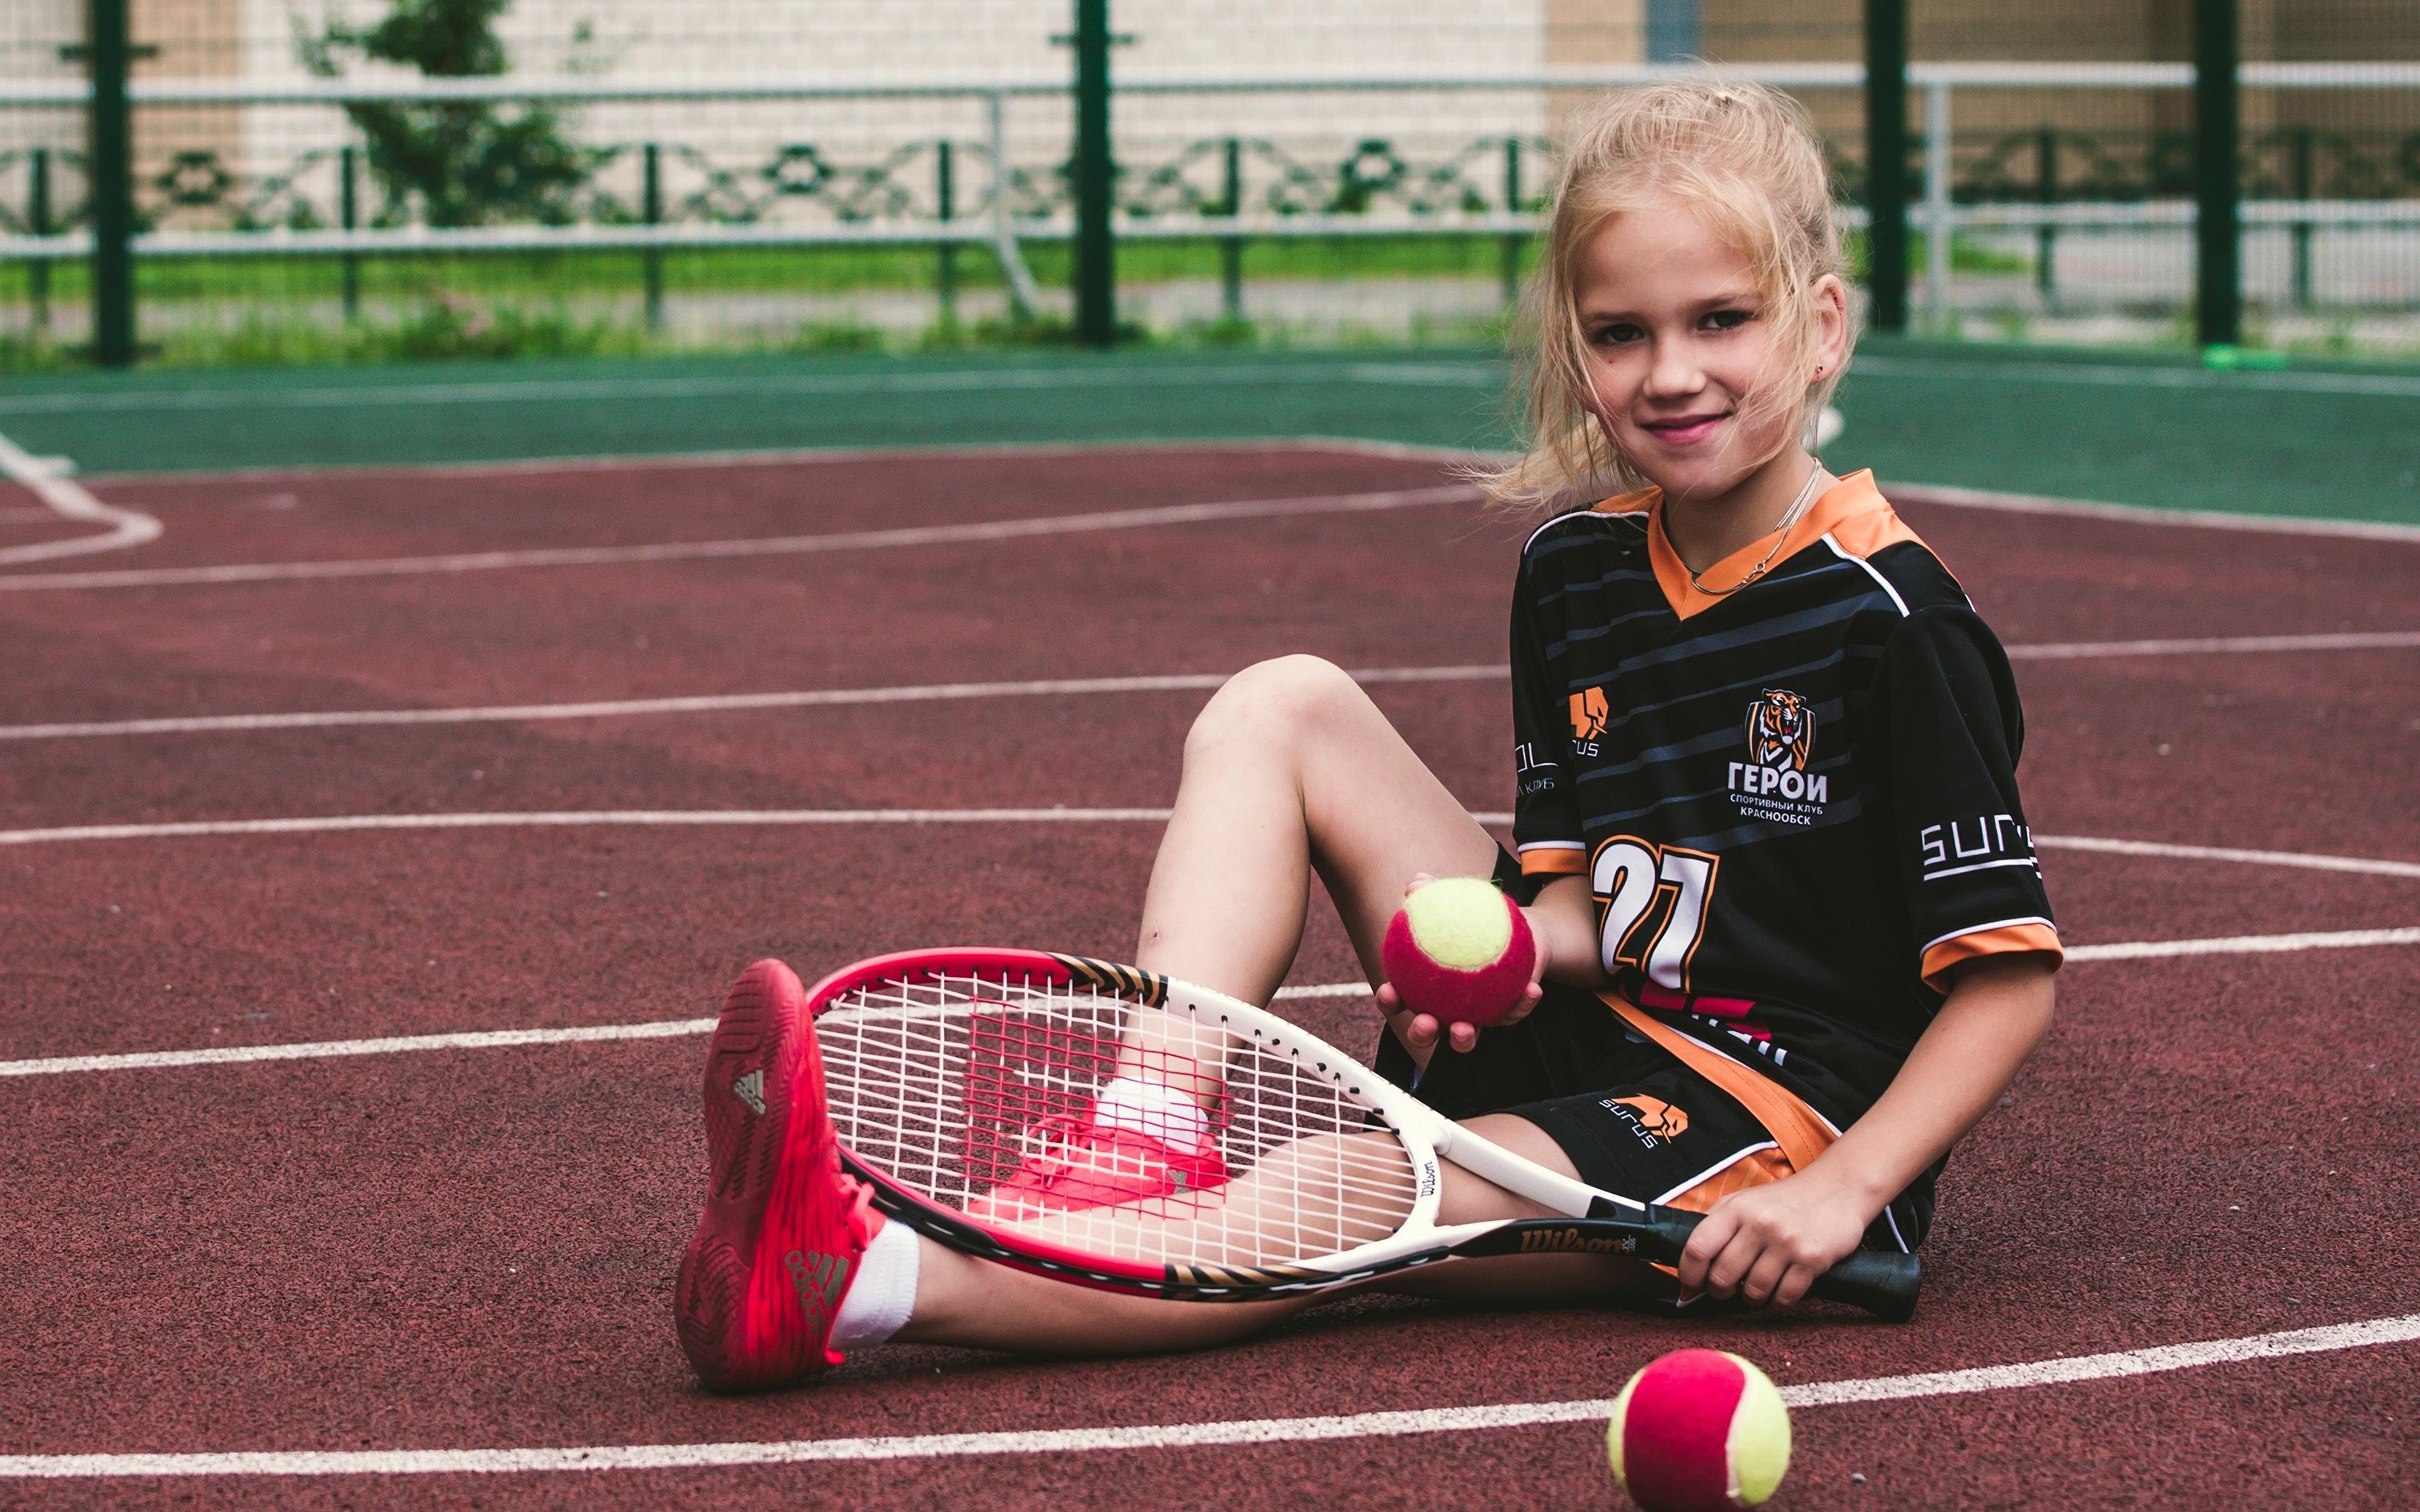 Image Little Girls Smile Child Sport Tennis Sit Ball 3840x2400